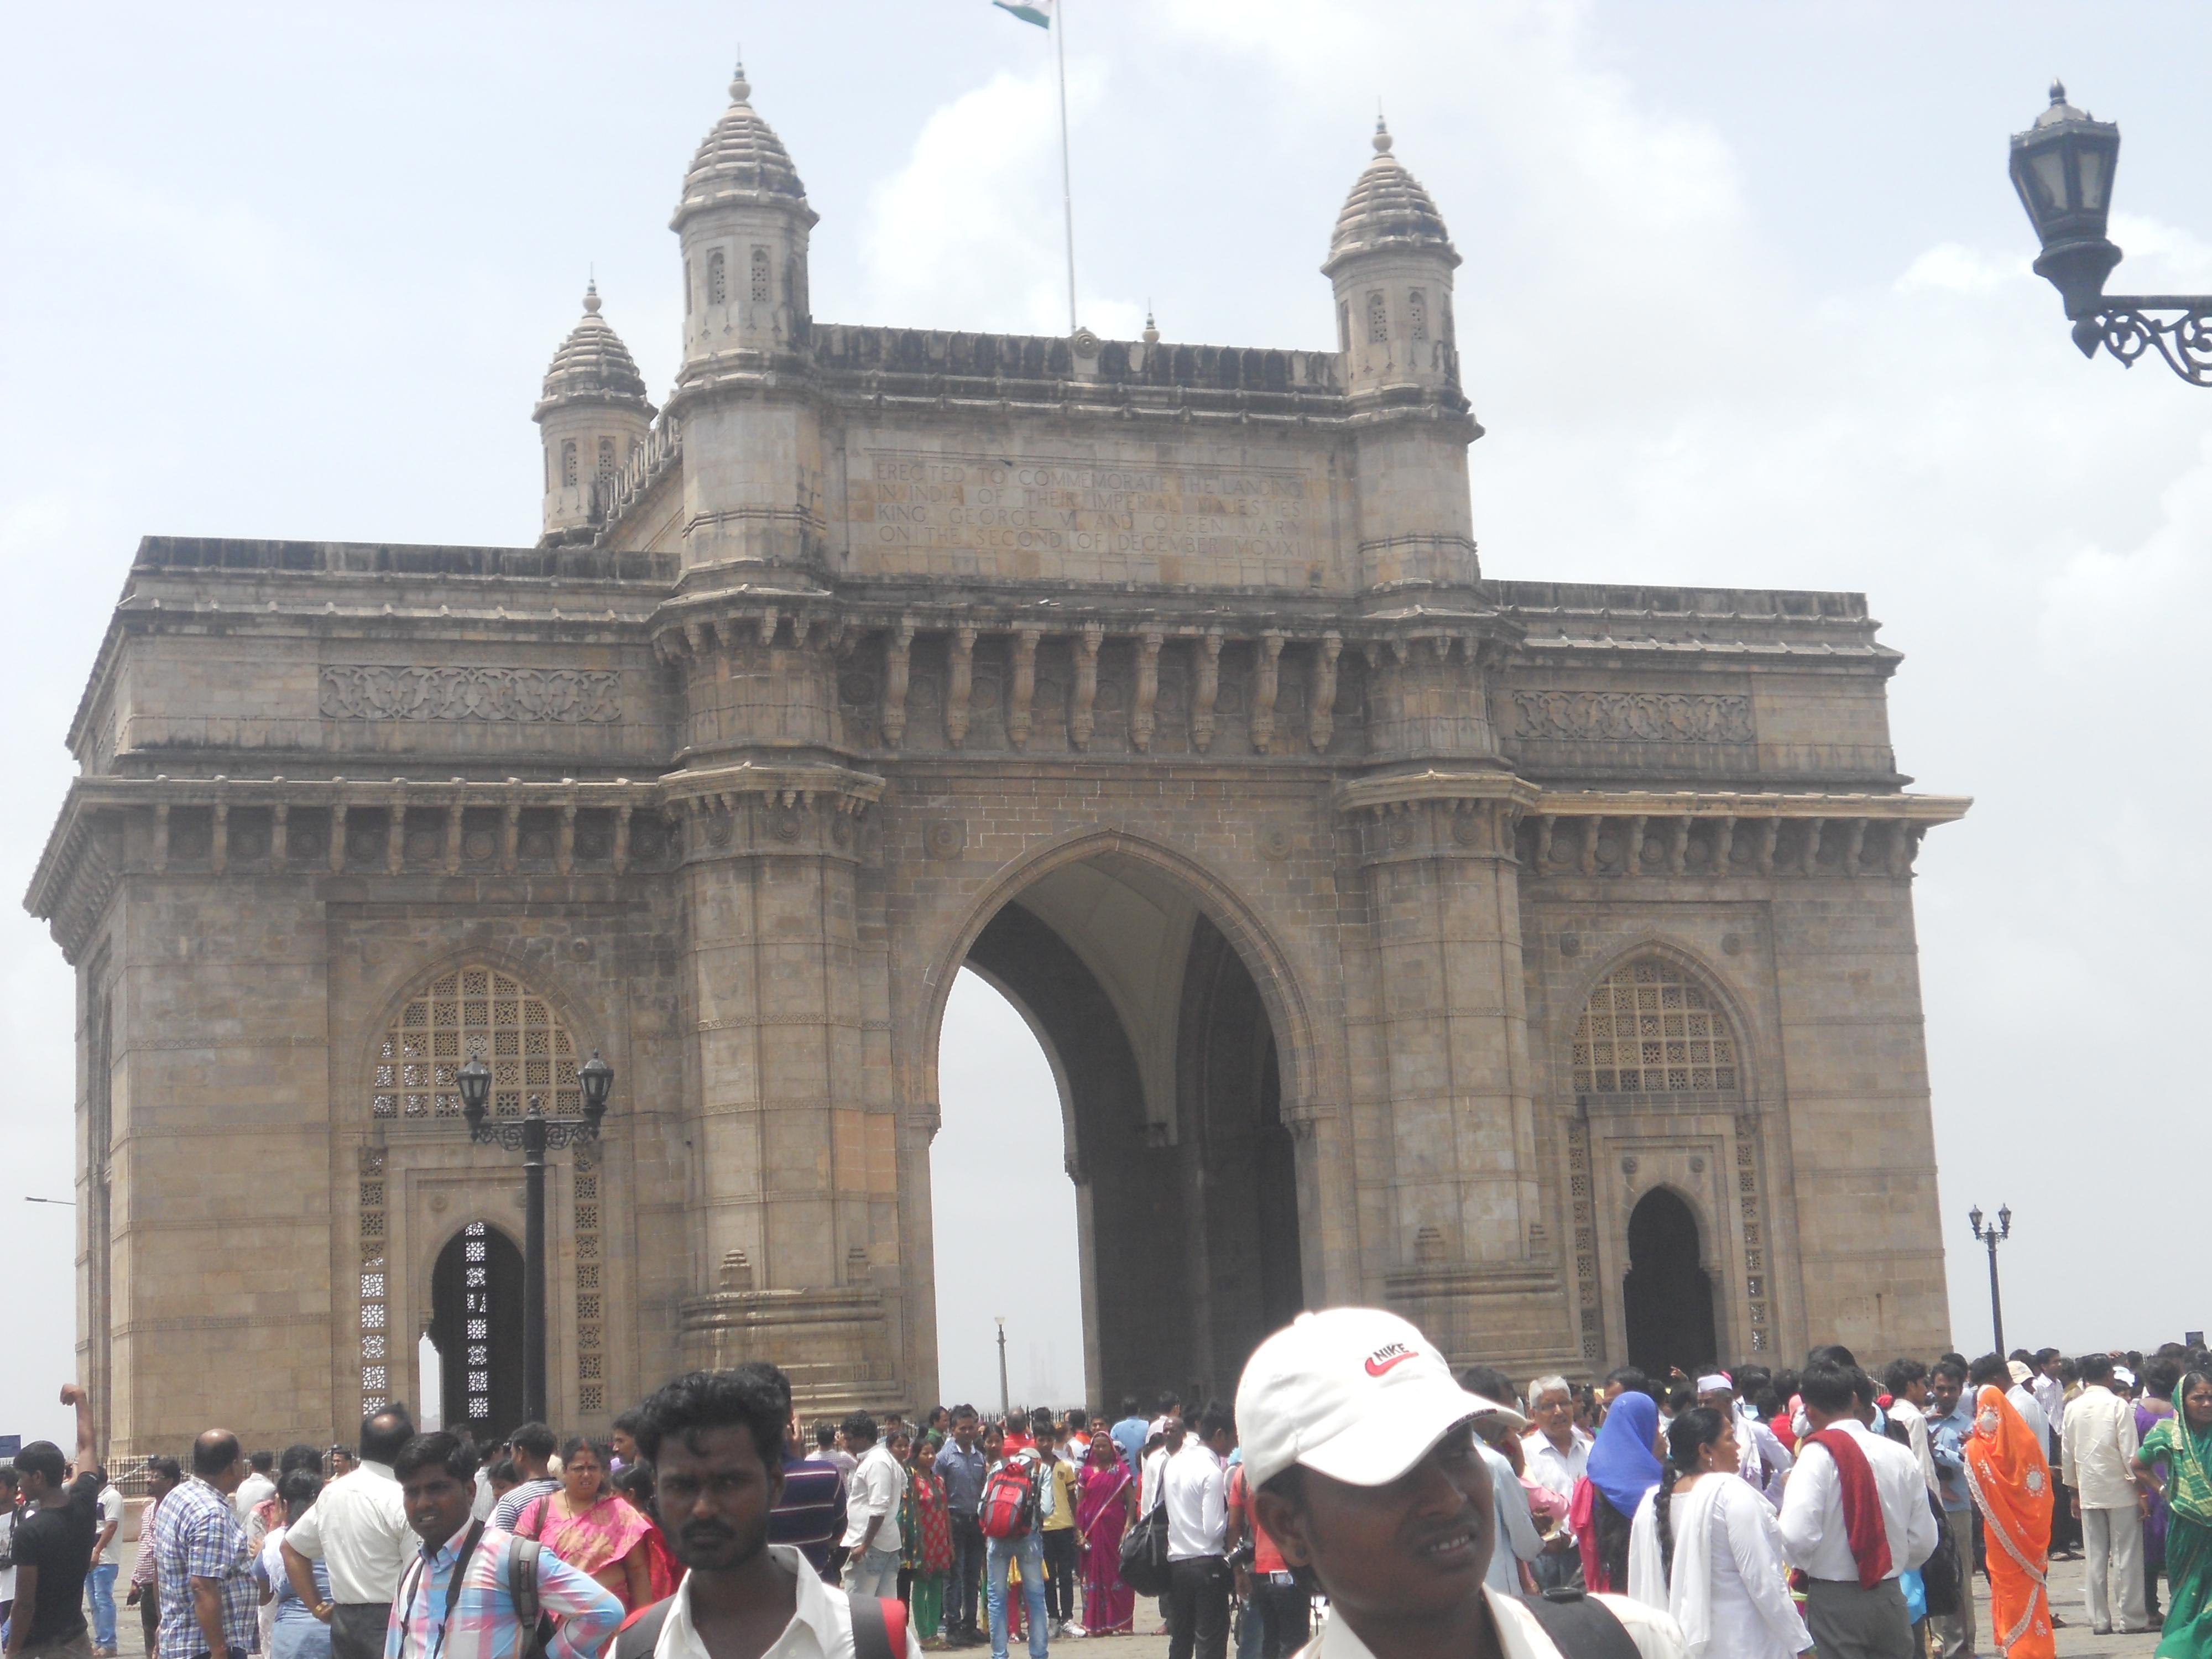 architecture of mumbai curator hall